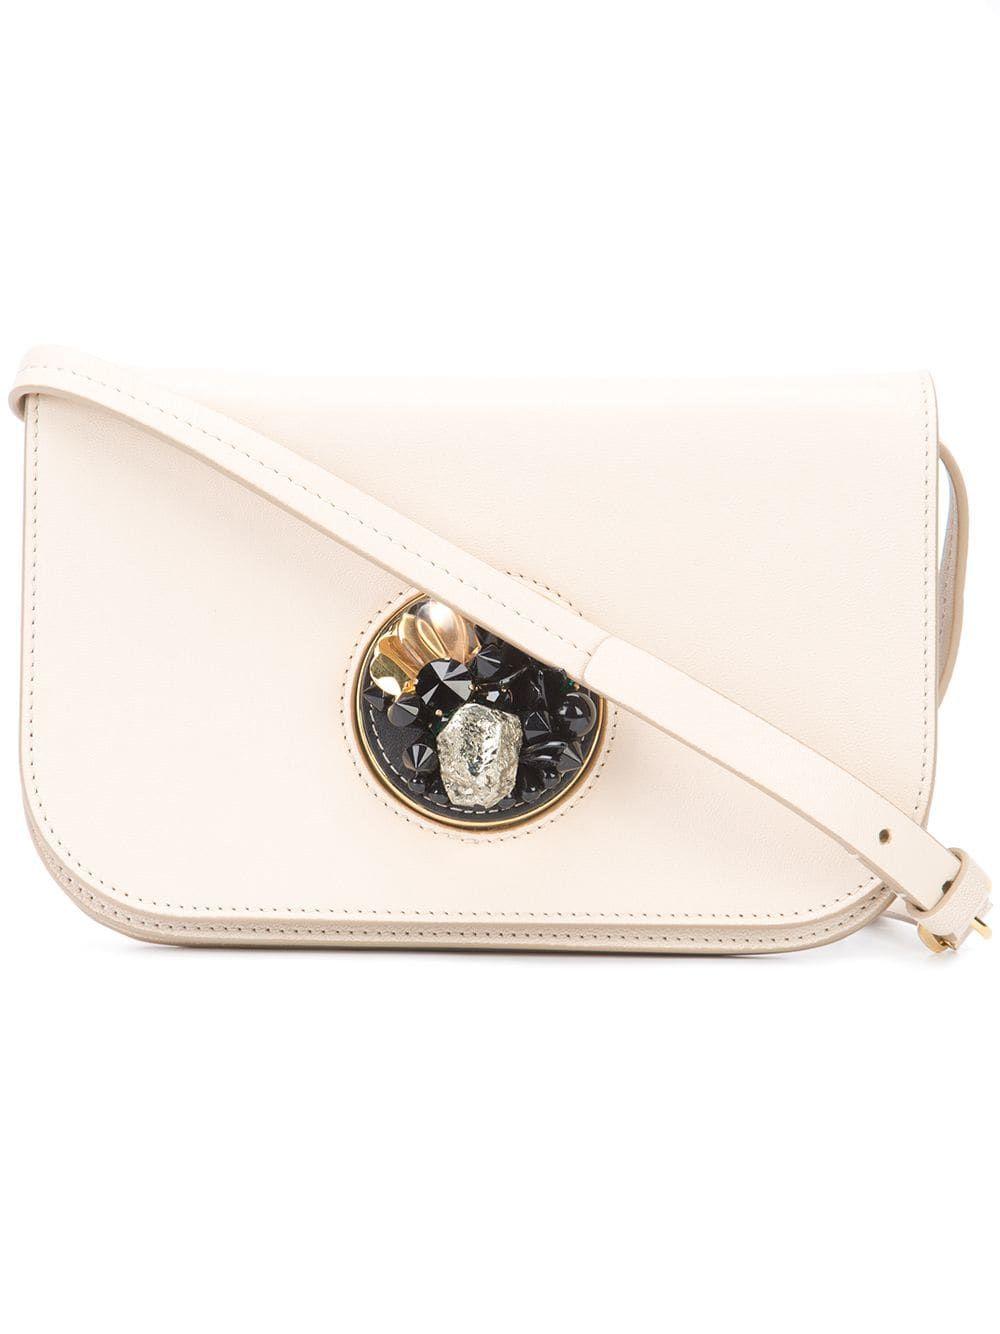 Marni Leather Pois Crossbody Bag White